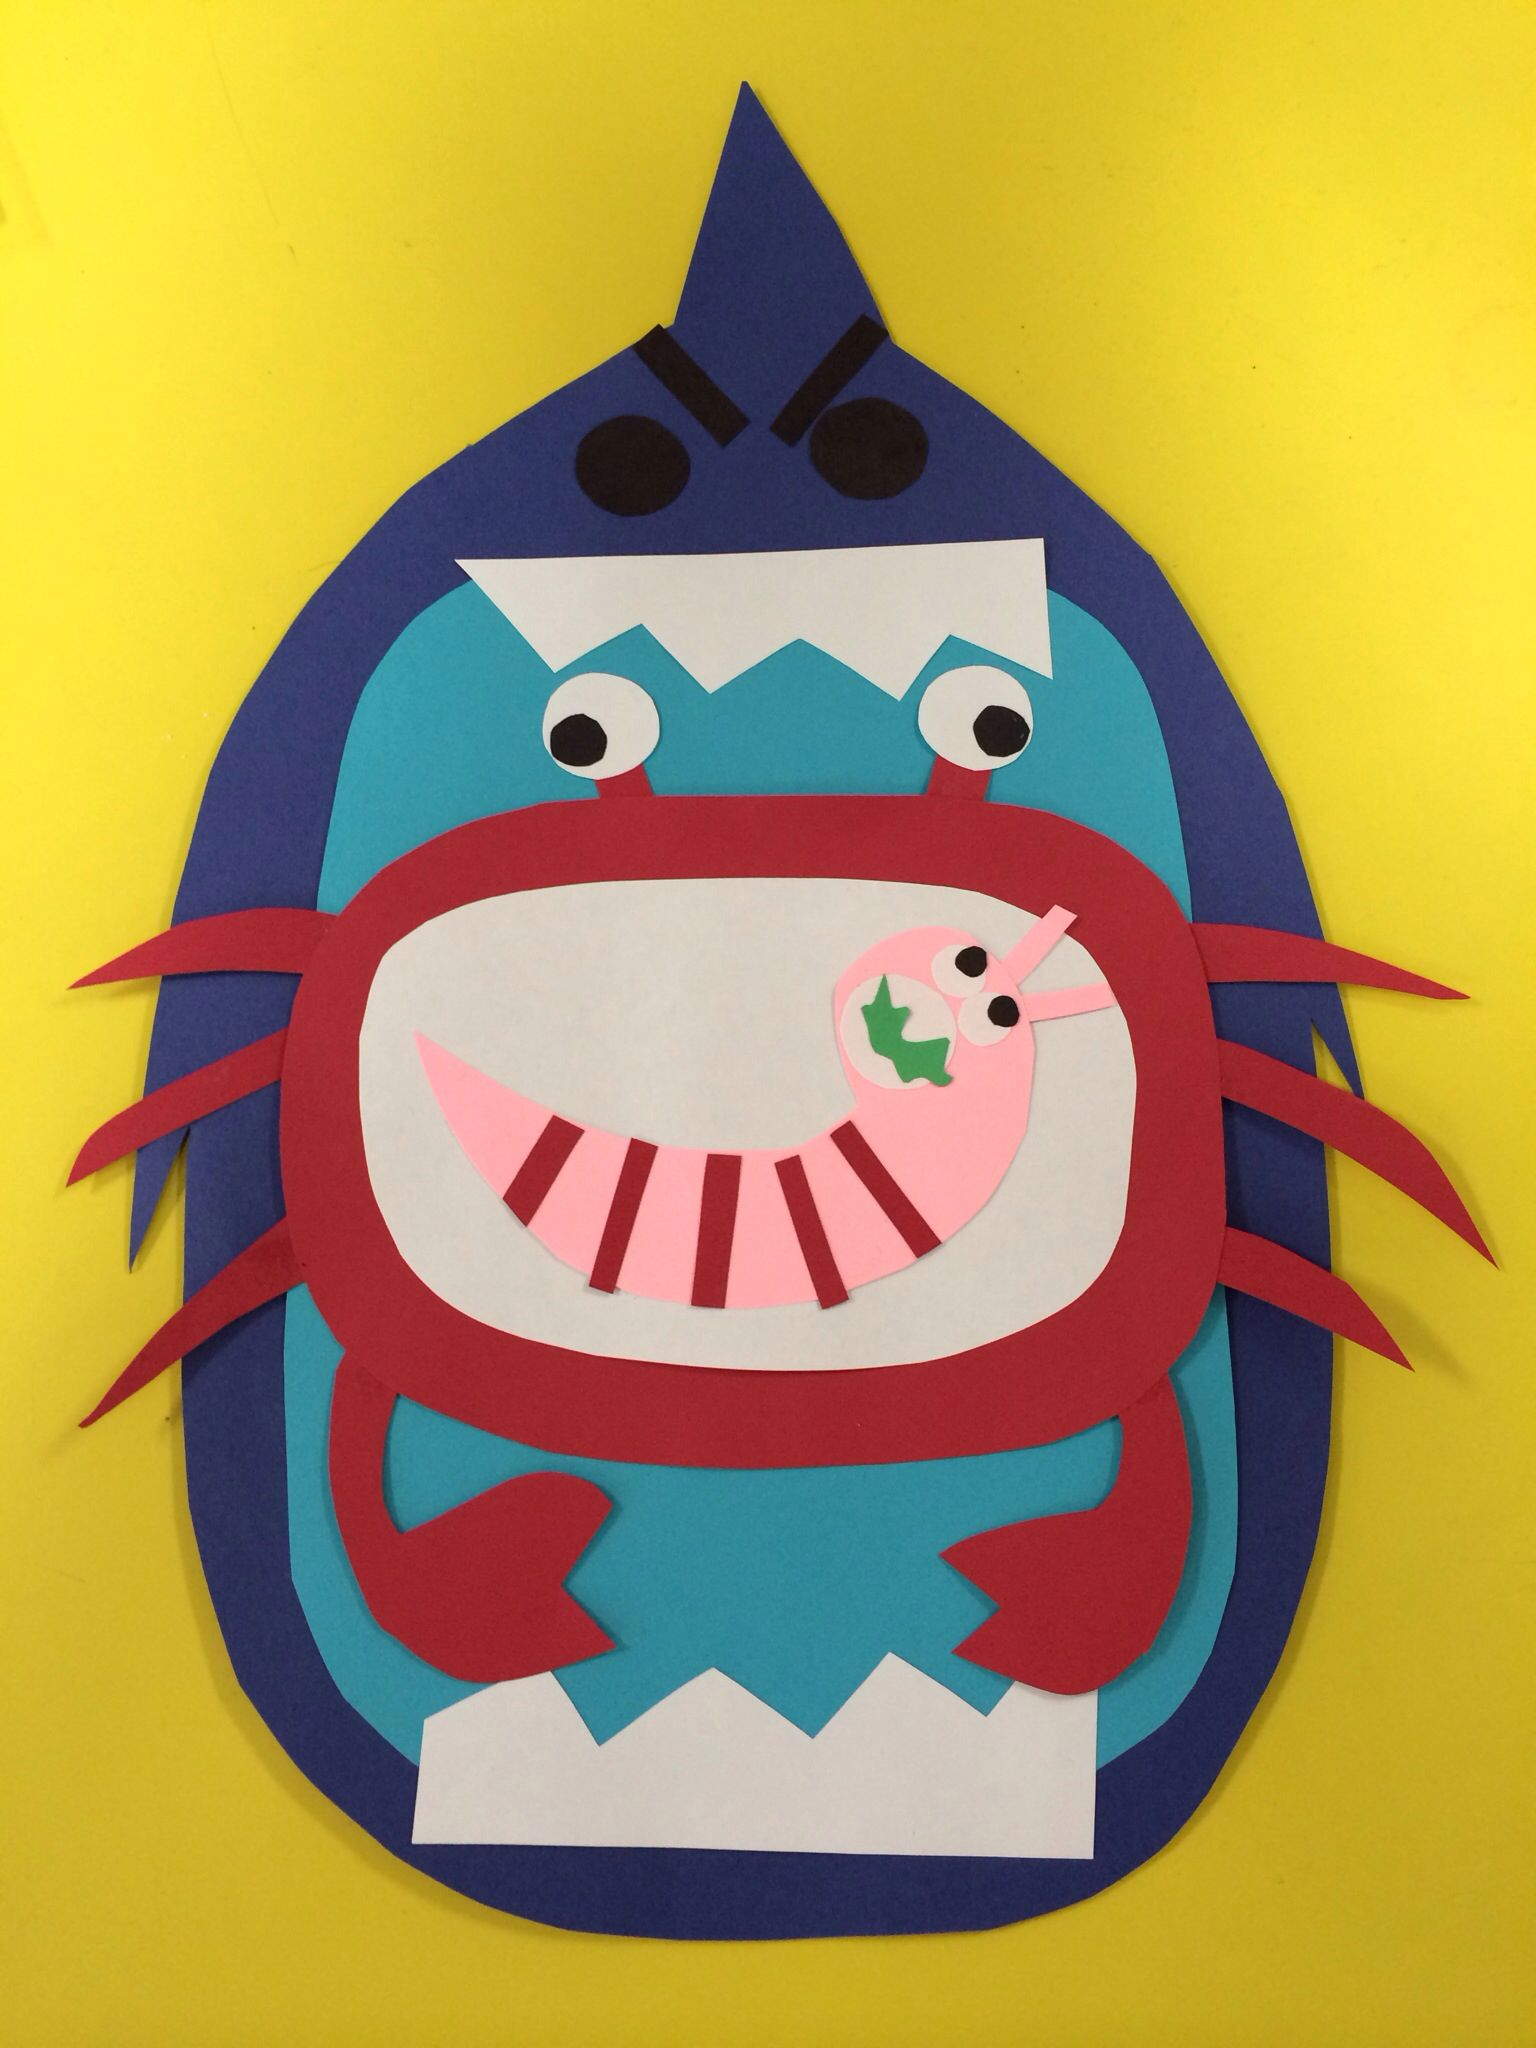 Food Chain Big Mouth Foodchain Predator Consumer